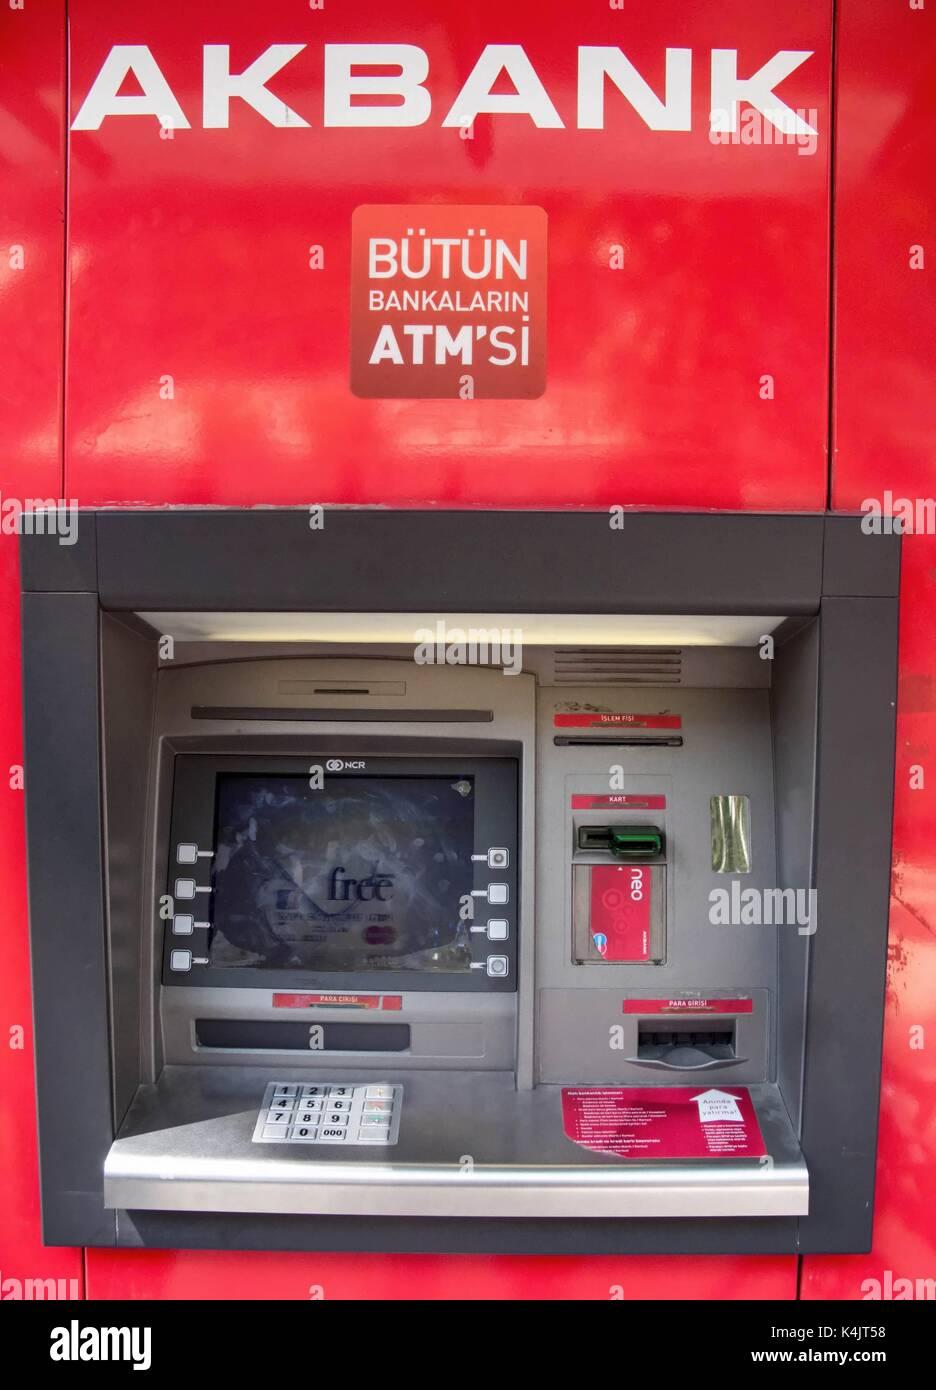 Máquina atm turca, Estambul, Turquía Foto de stock